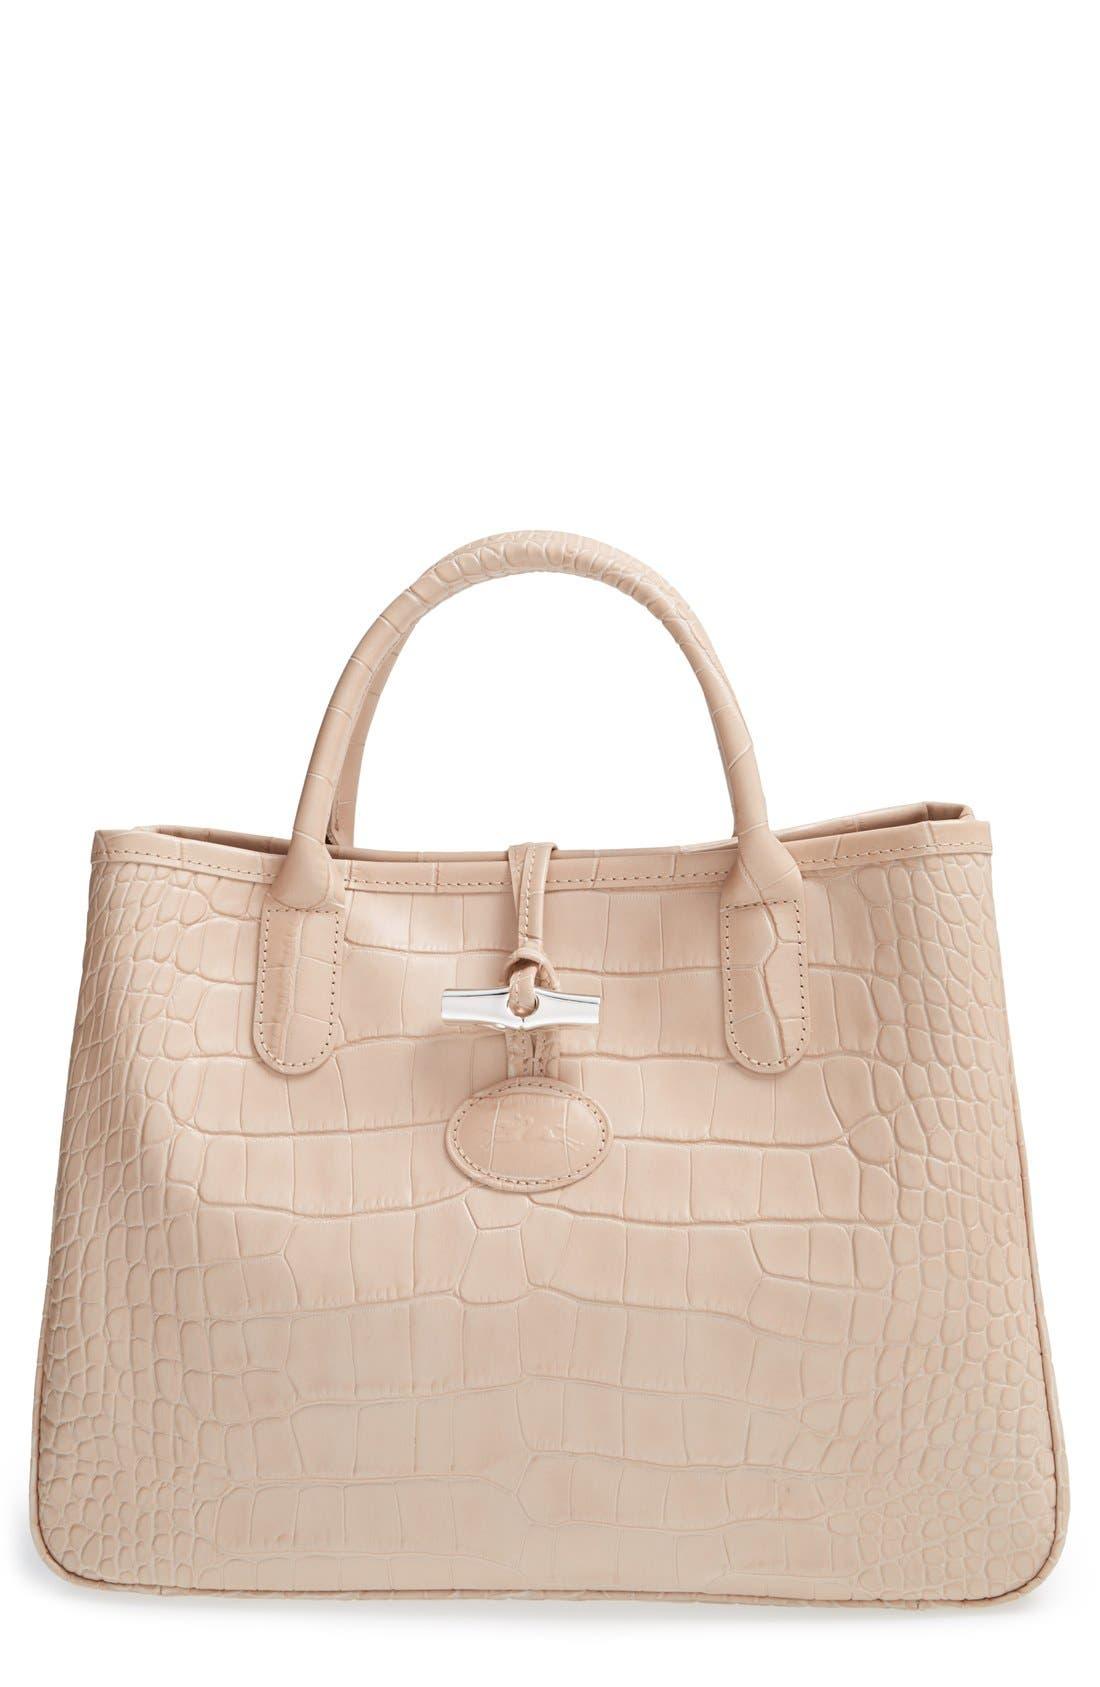 Main Image - Longchamp 'Small Roseau Croco' Shoulder Tote